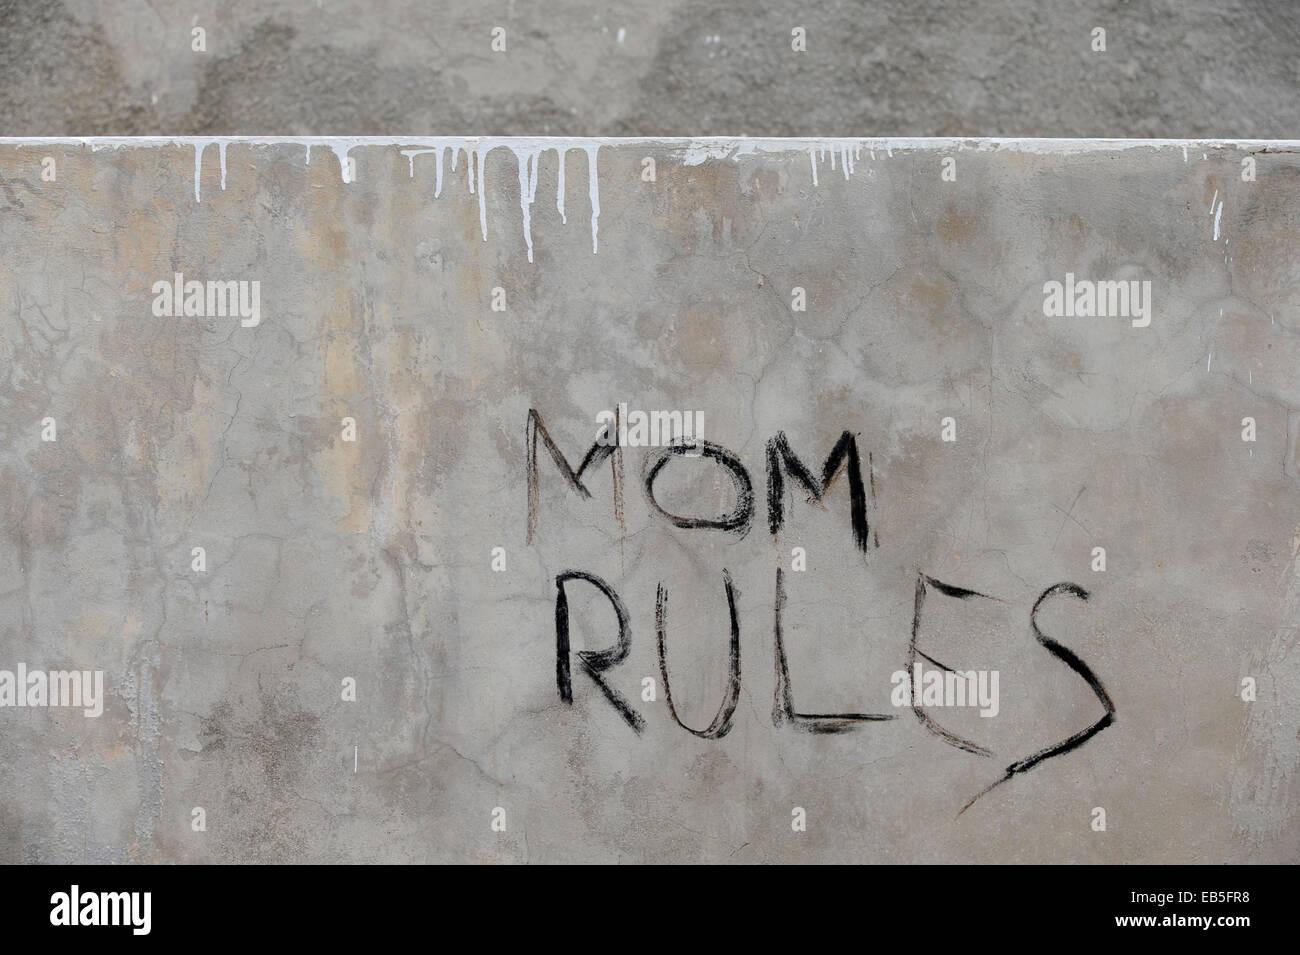 Graffiti 'Mom Rules' on grey wall - Stock Image